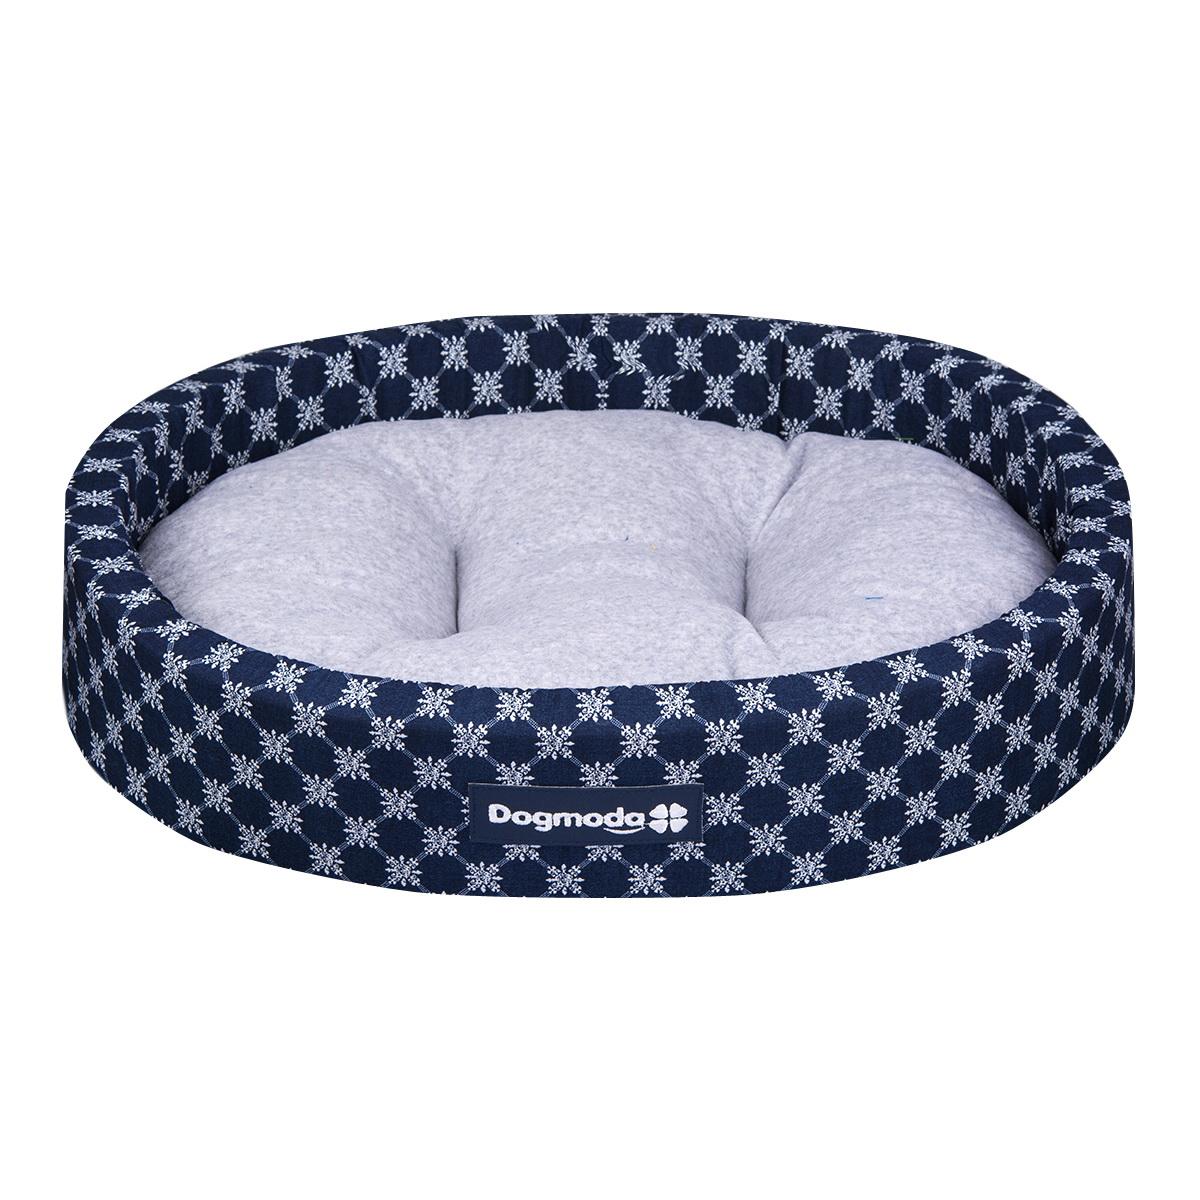 Лежак для животных Dogmoda Сезон, цвет: синий, серый, 50 х 44 х 12 см